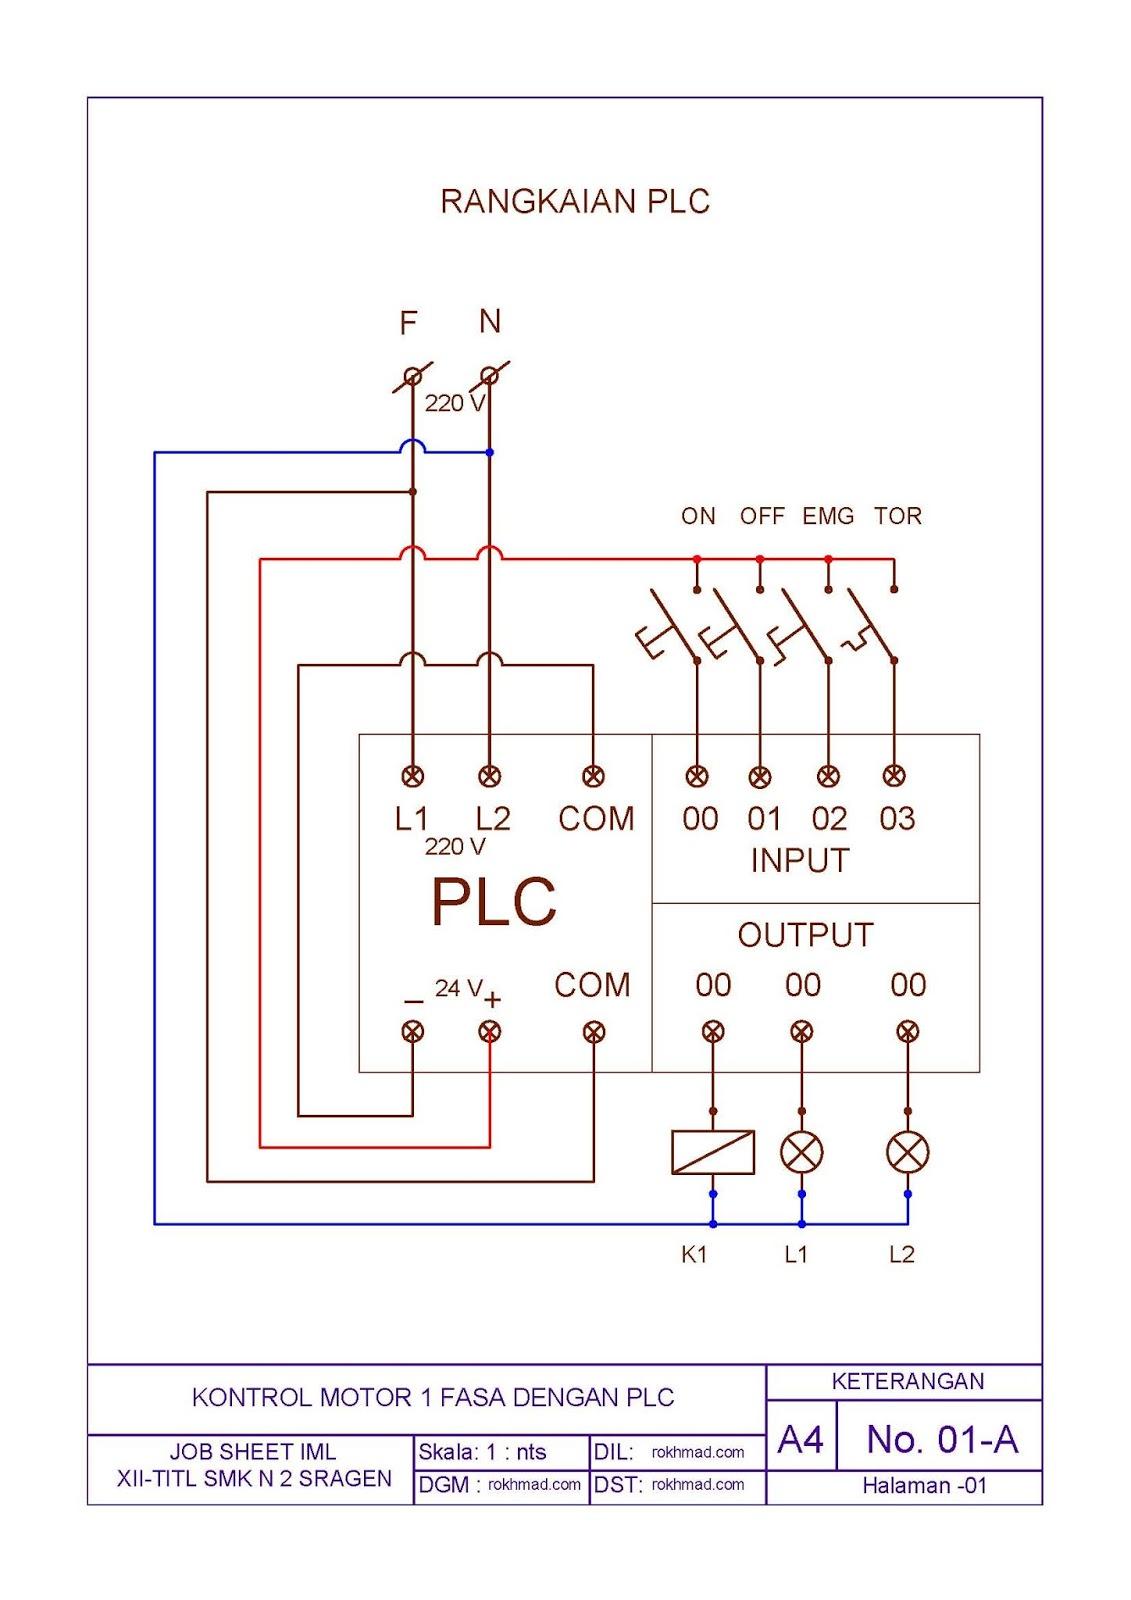 Contoh Soal Dan Contoh Pidato Lengkap Gambar Rangkaian Motor Listrik